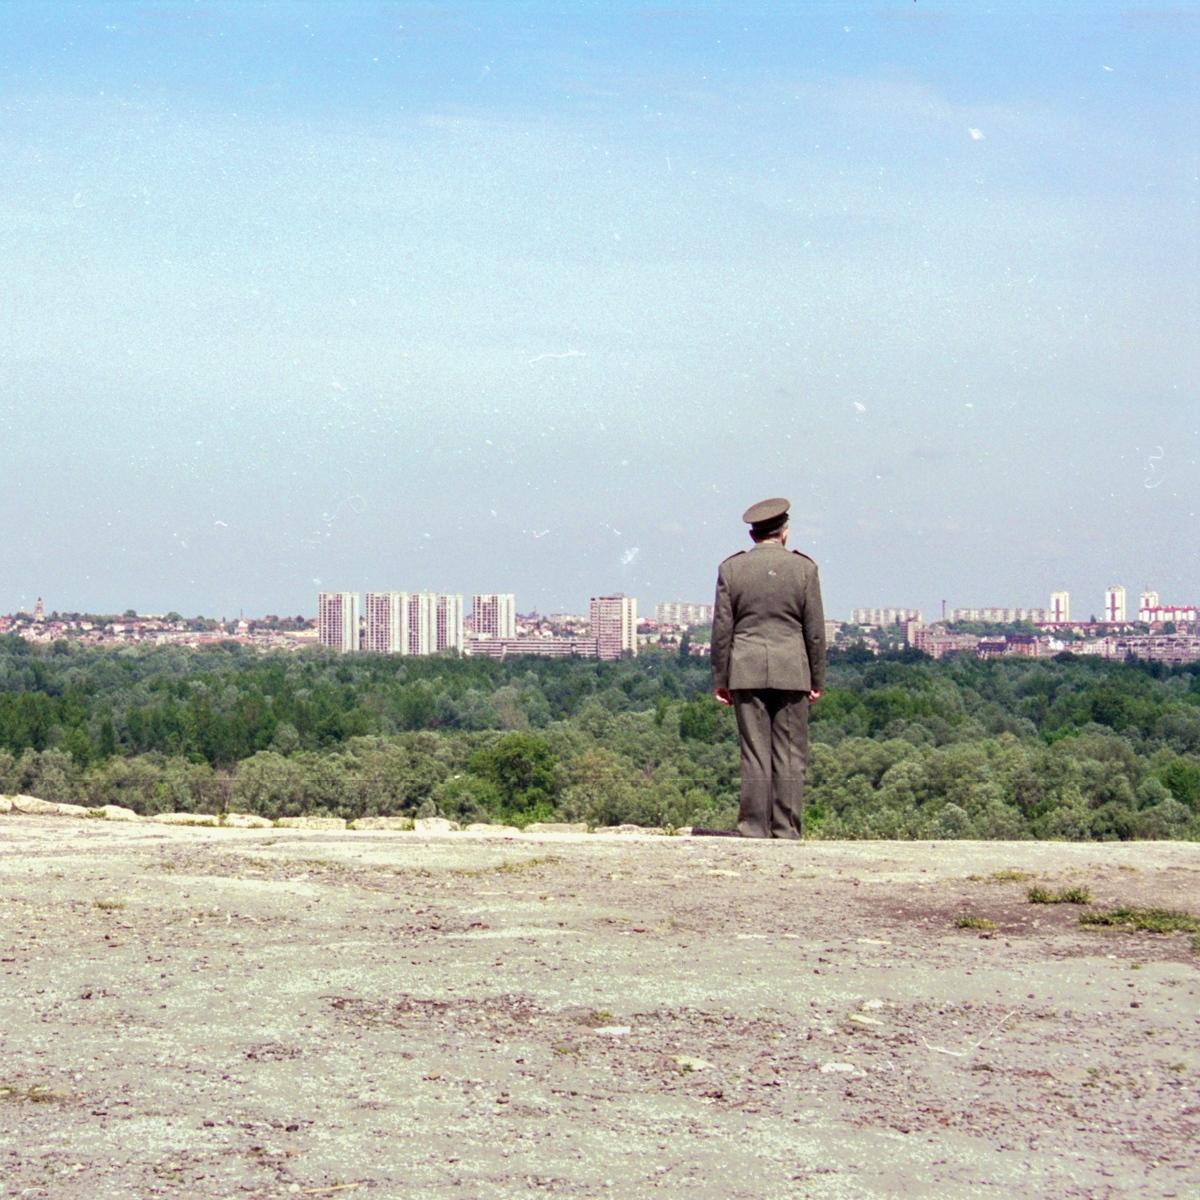 Beograd, Serbia 2003